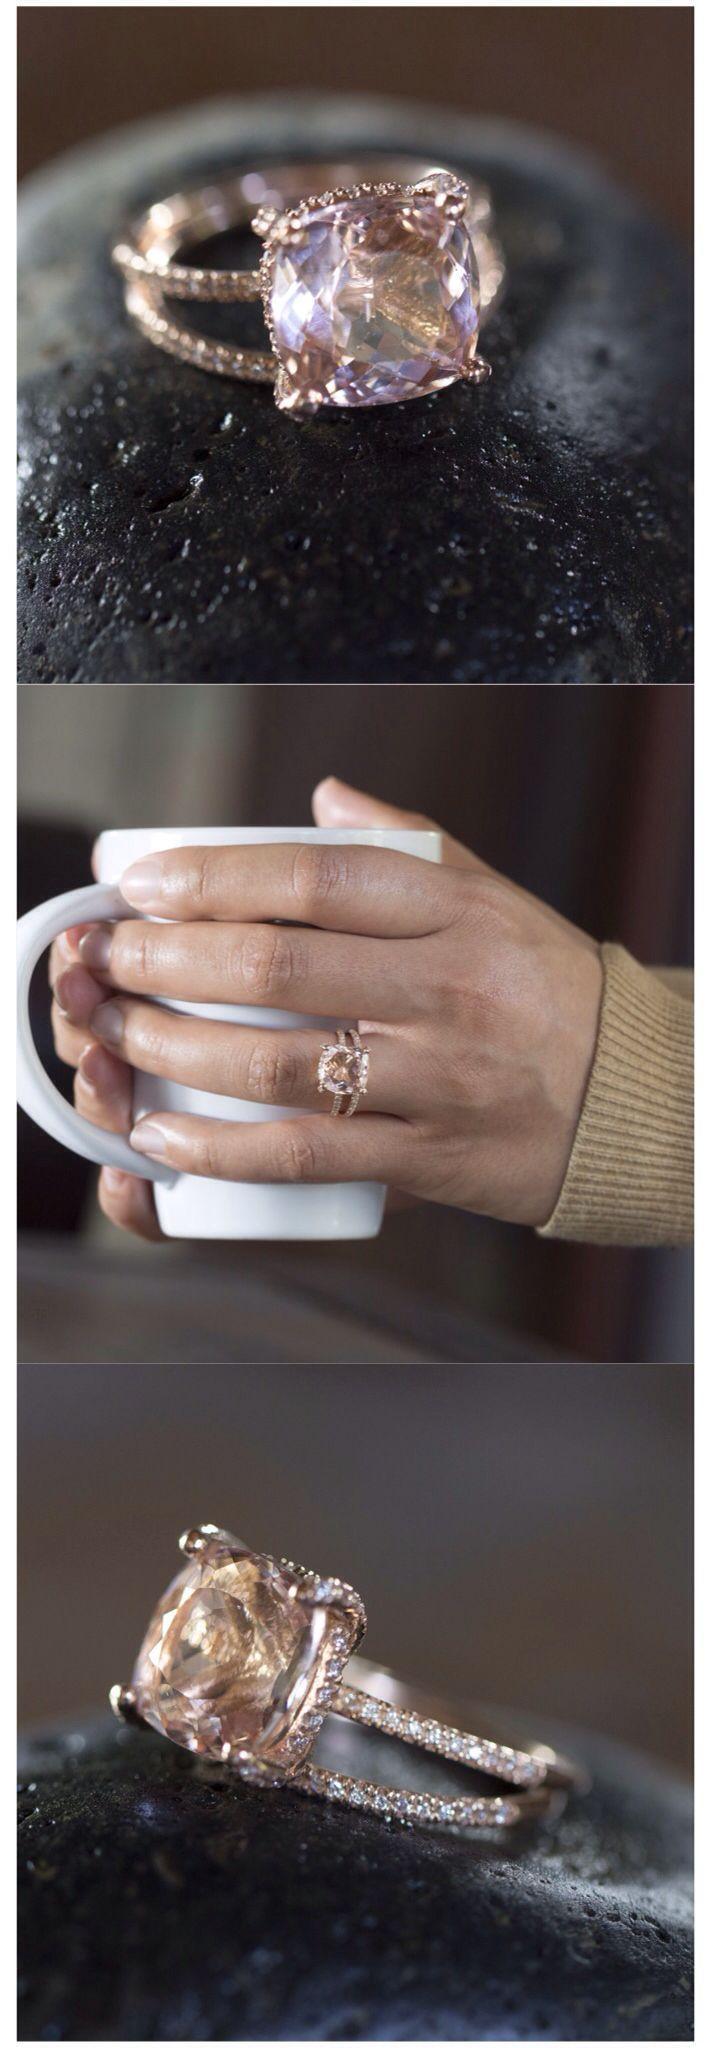 Свадьба - Morganite Engagement Ring, Cushion Cut Morganite Ring, Cushion Cut Morganite Engagement Ring, Diamond Halo Ring, Rose Gold, 14k - LS3770